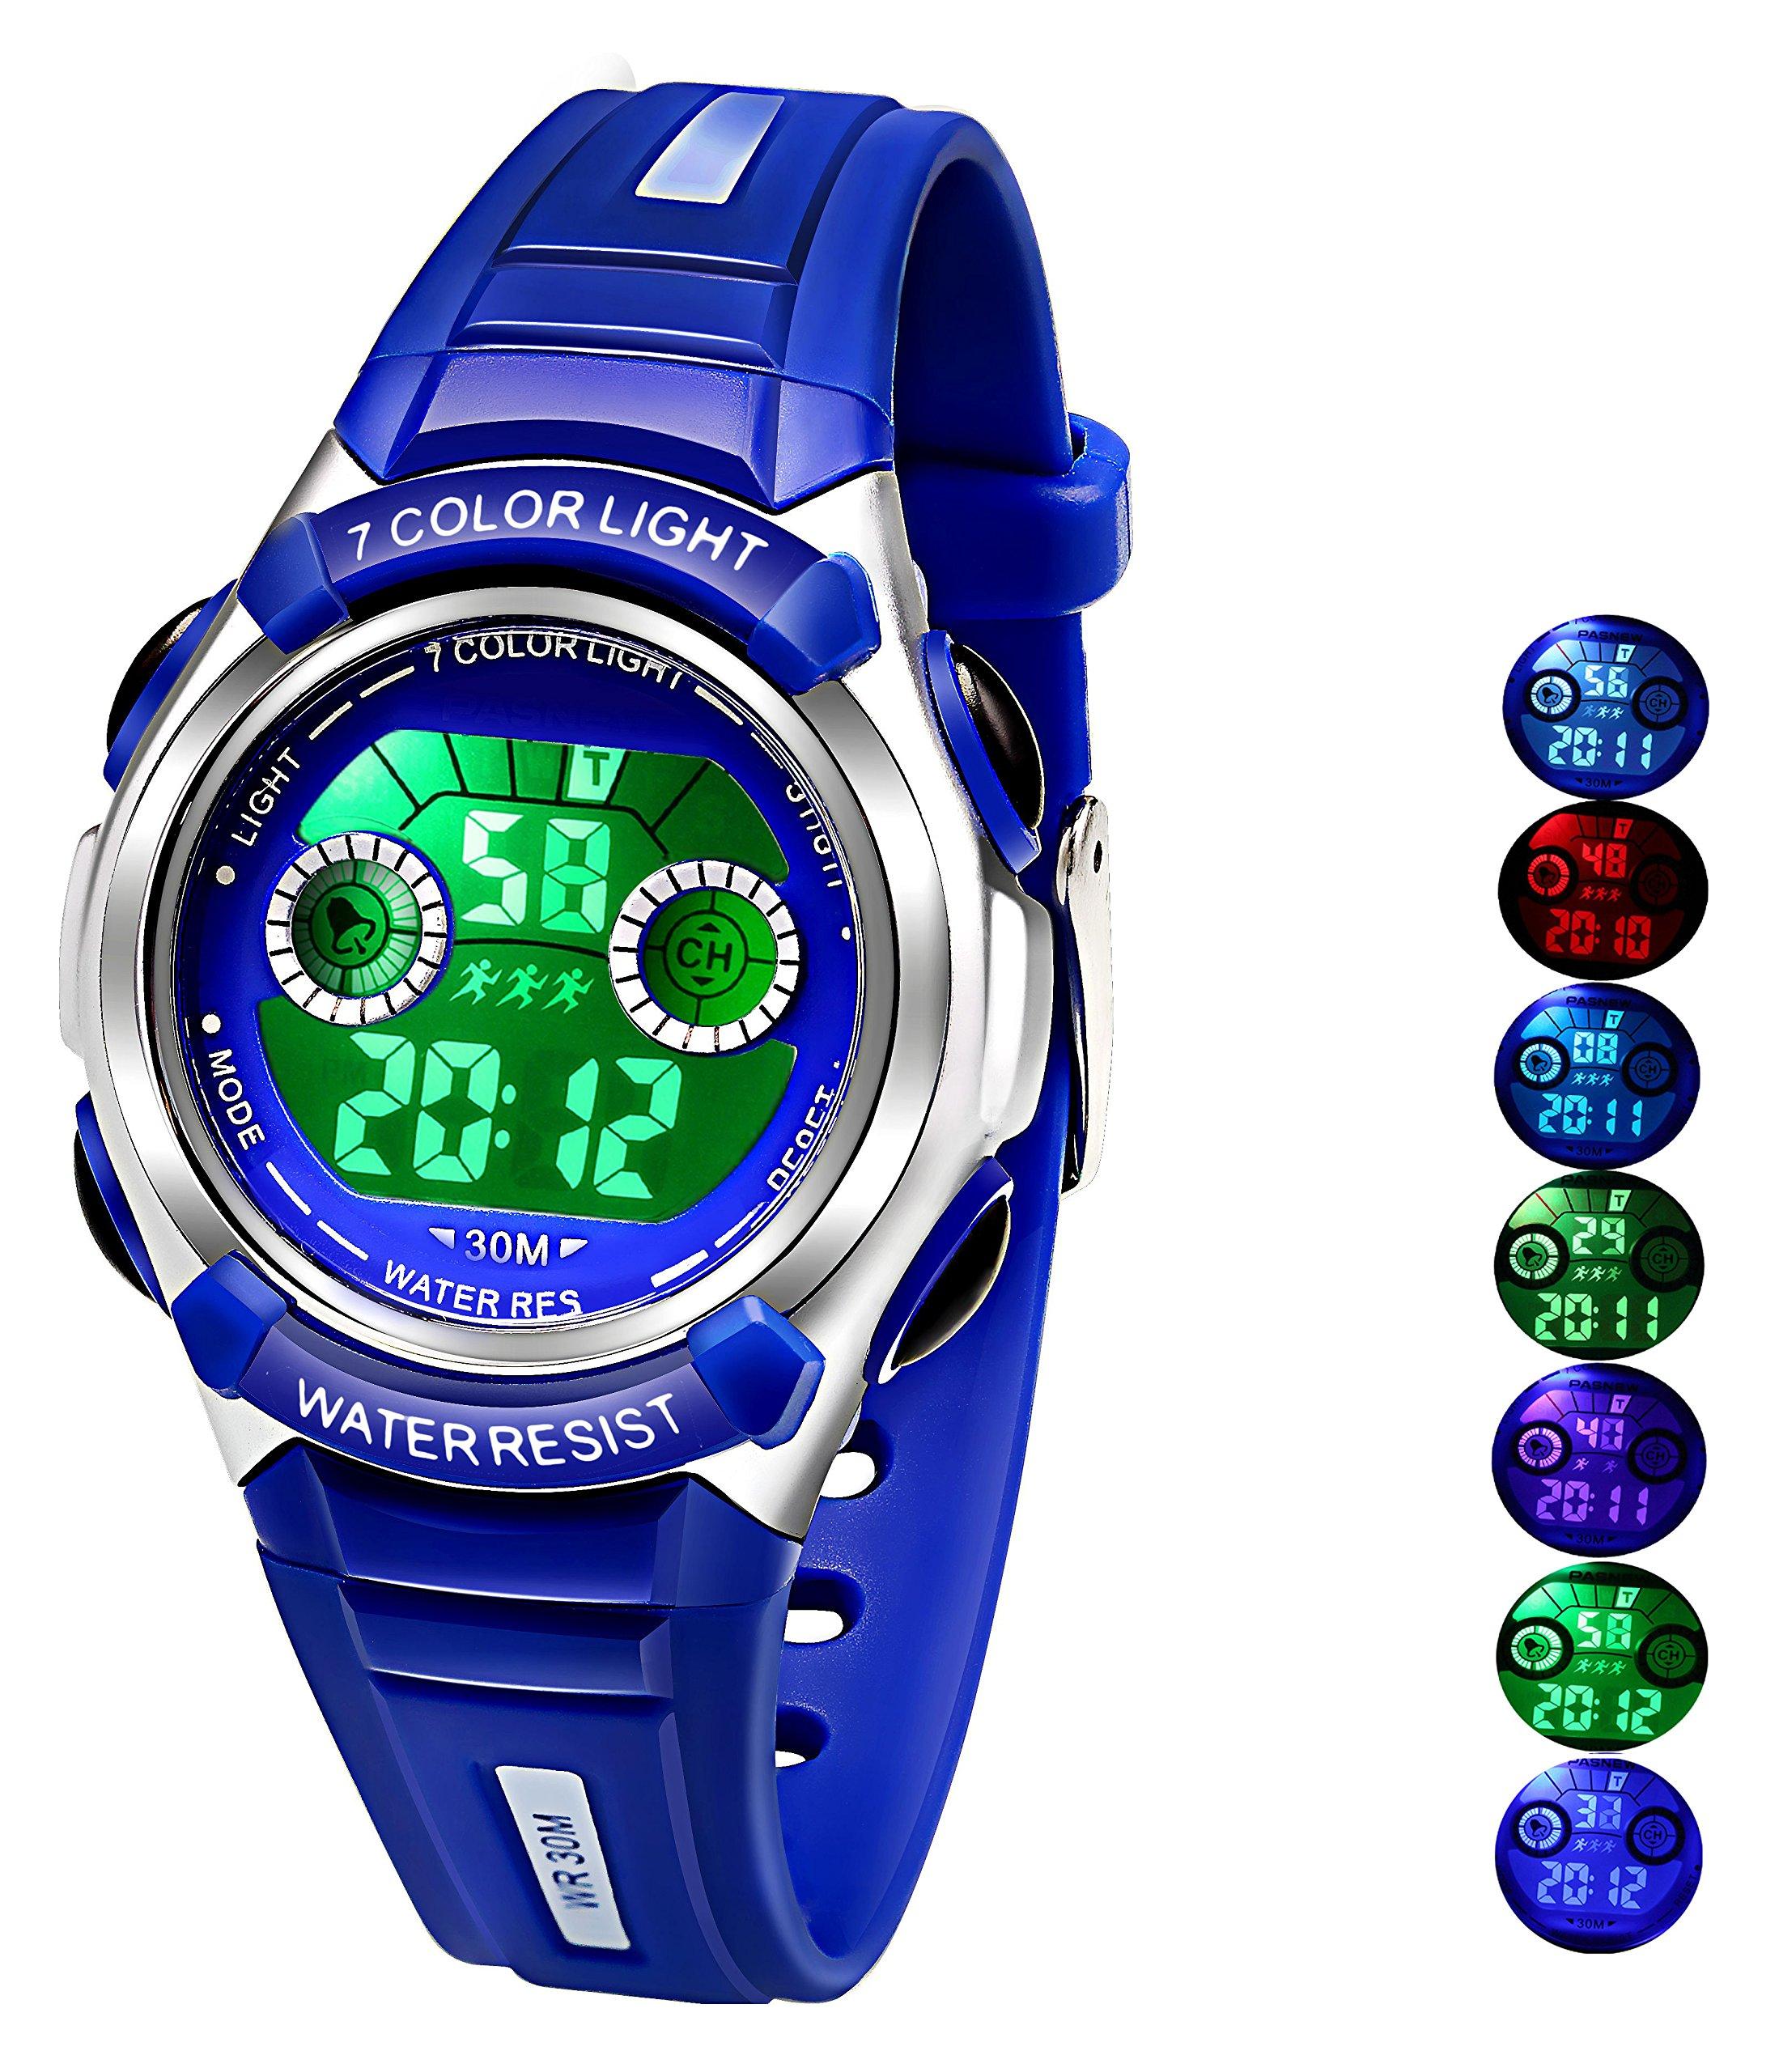 Multi Coloured Lights Time Teacher Watch for Boys Digital Sports Swim,Frozen,Waterproof Kids Boys Watches Blue,for Age 3-8